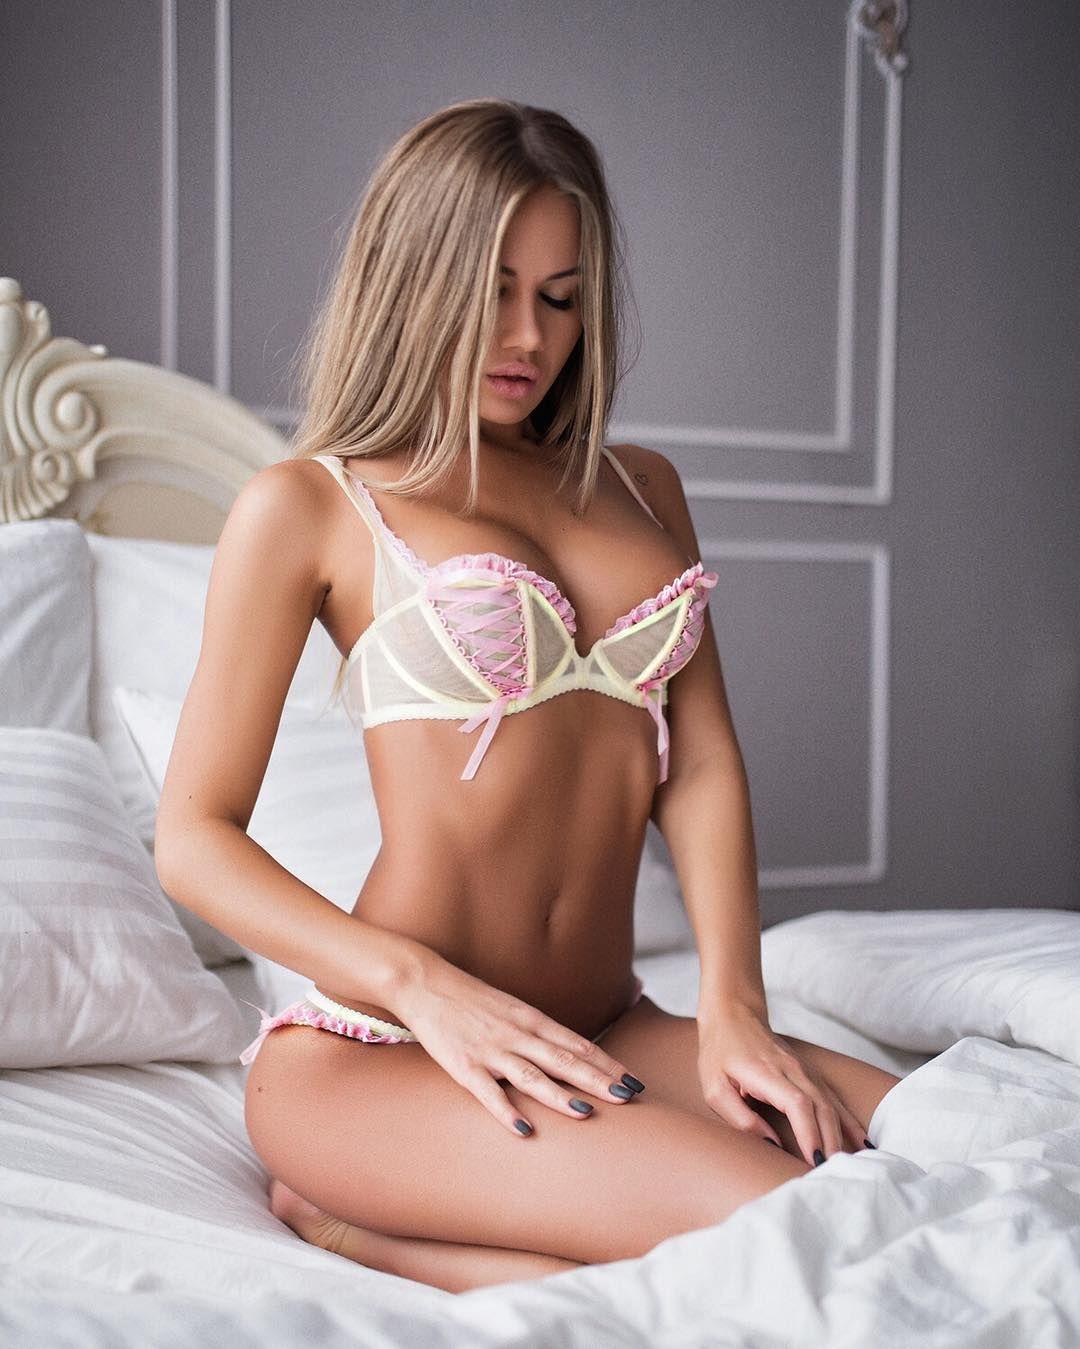 Playboy Morning Show Fashion